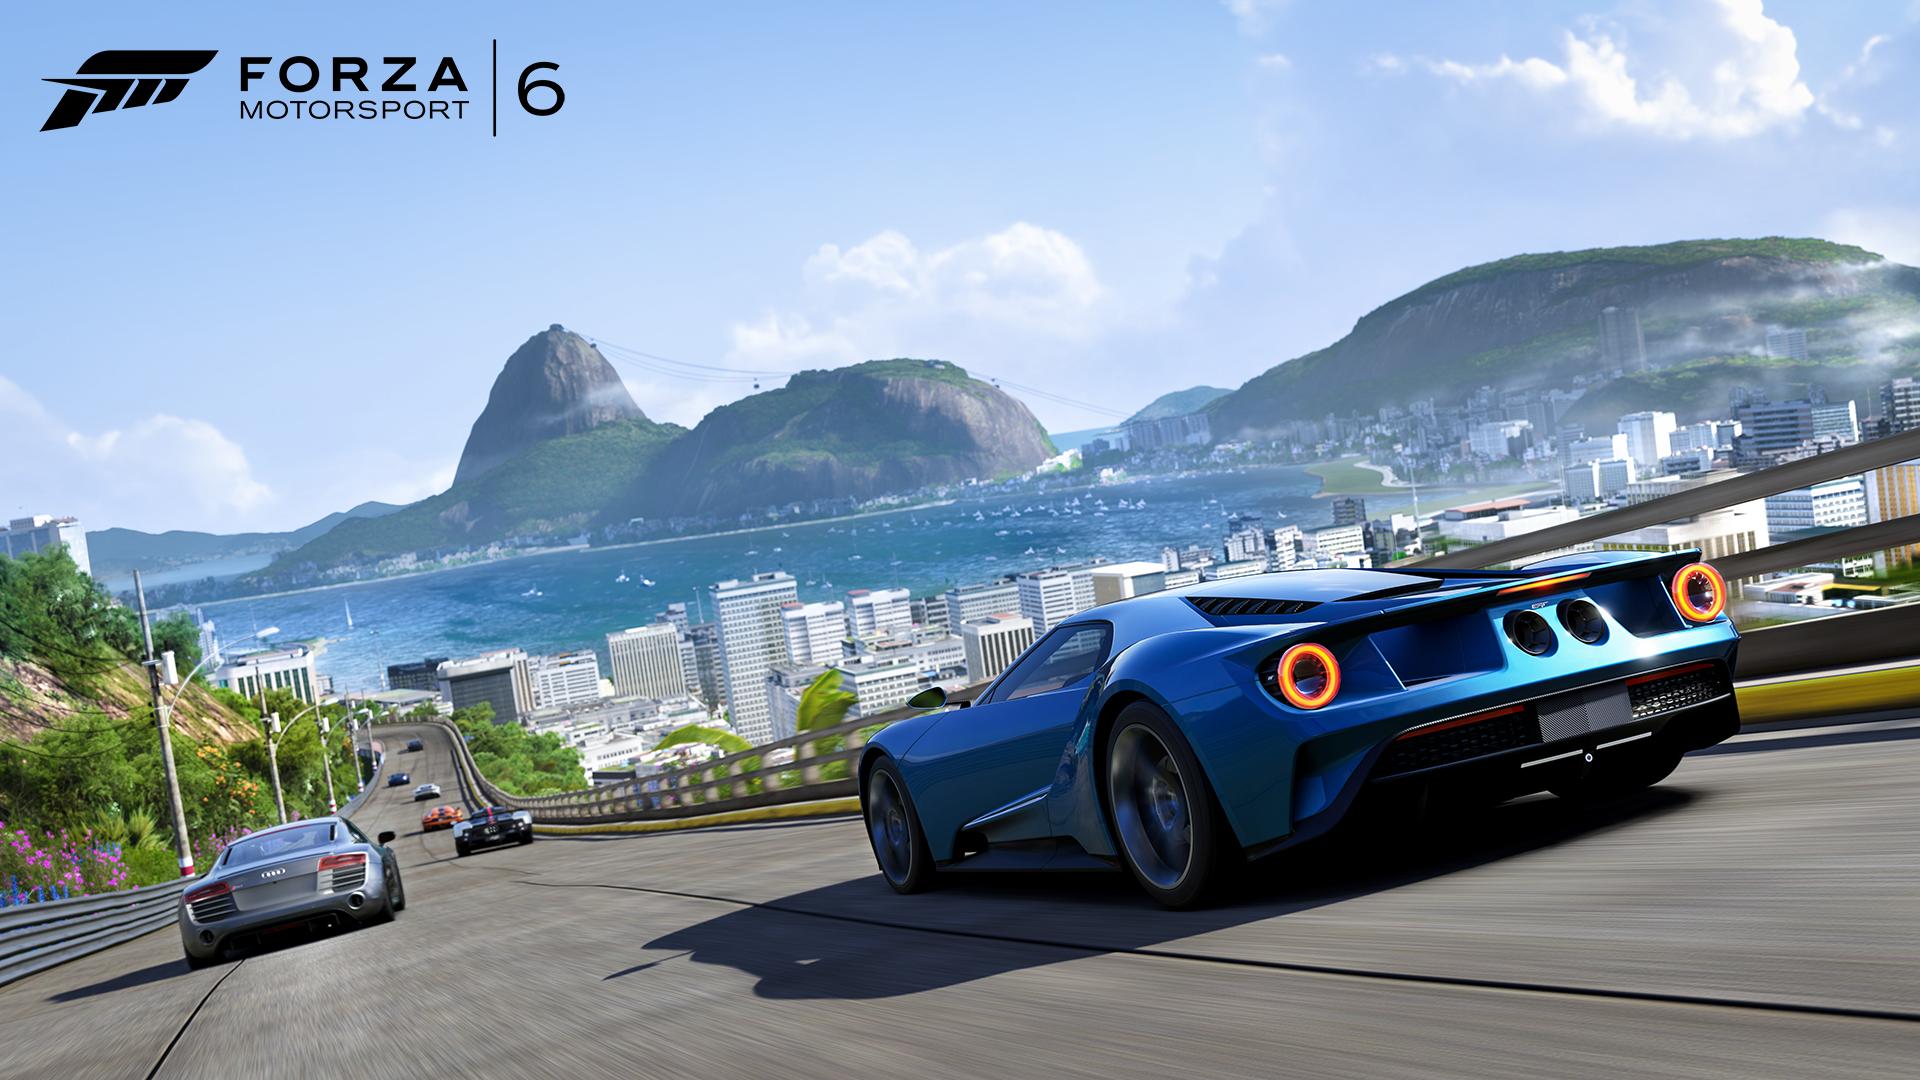 Forza Motorsport 6 - Ford GTForza Motorsport 6 - Ford GT